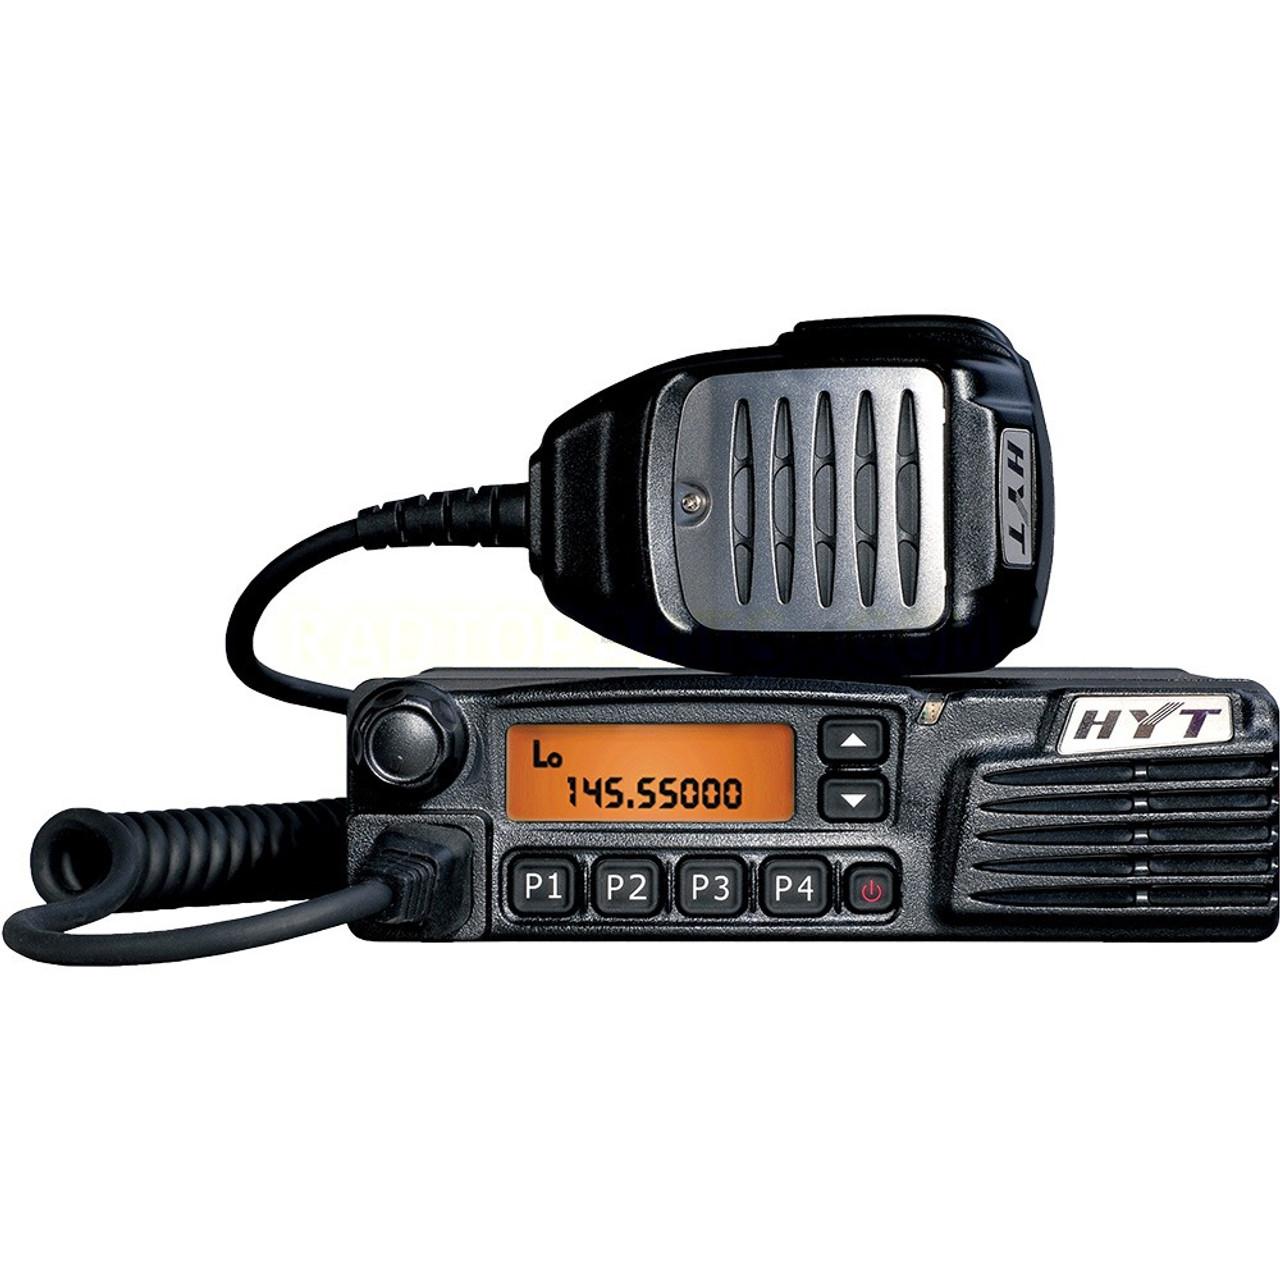 HYT TM-610 50 Watt Mobile Two Way Radio